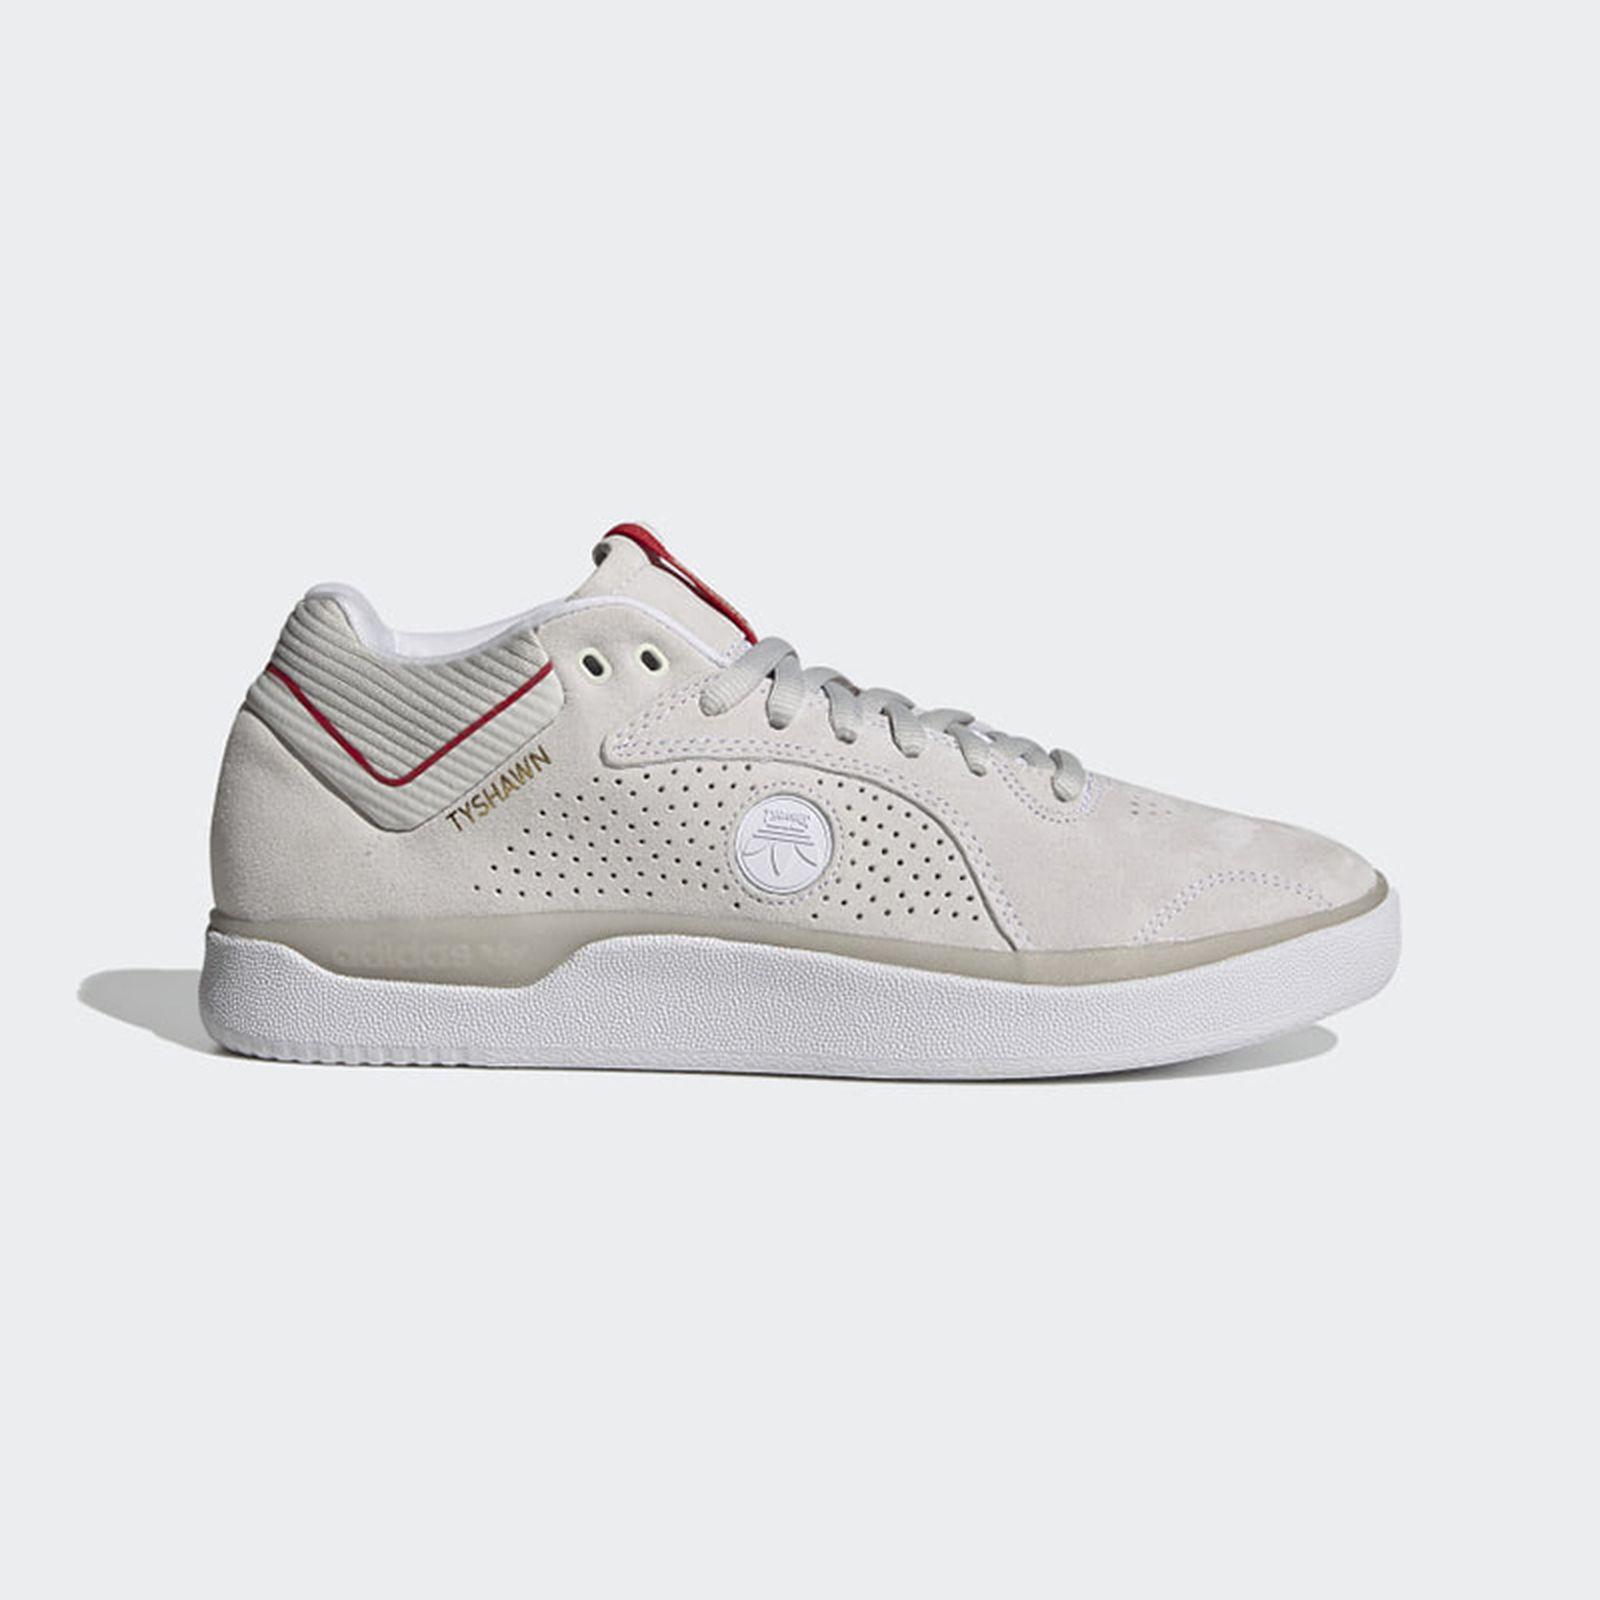 thrasher-adidas-superstar-adv-tyshawn-jones-release-date-price-1-08